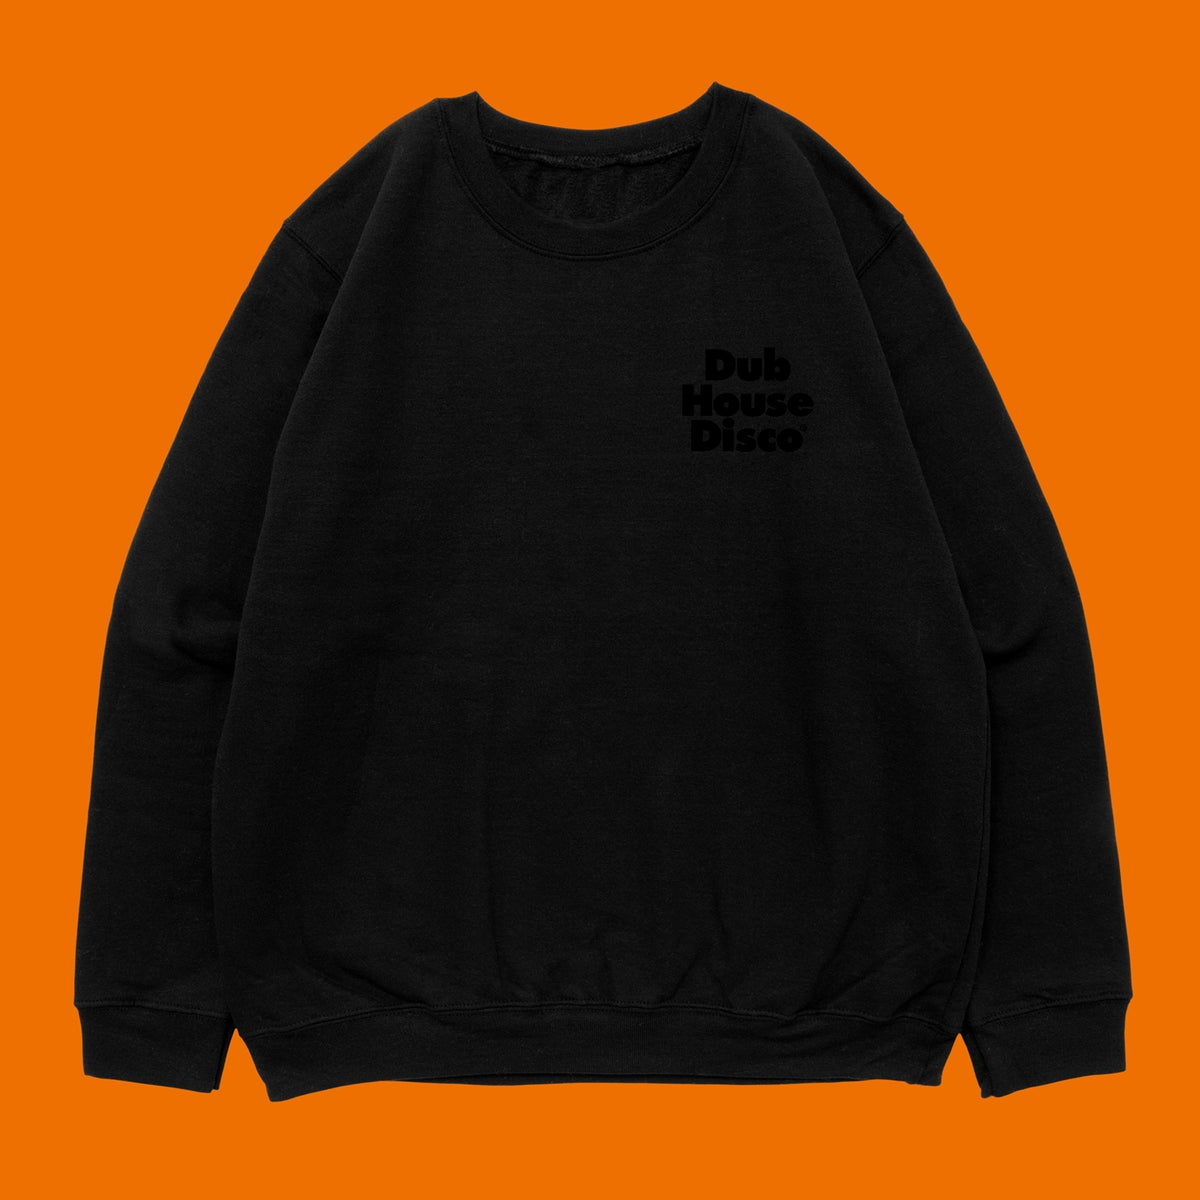 Image of Dub House Disco –Black On Black Sweatshirt